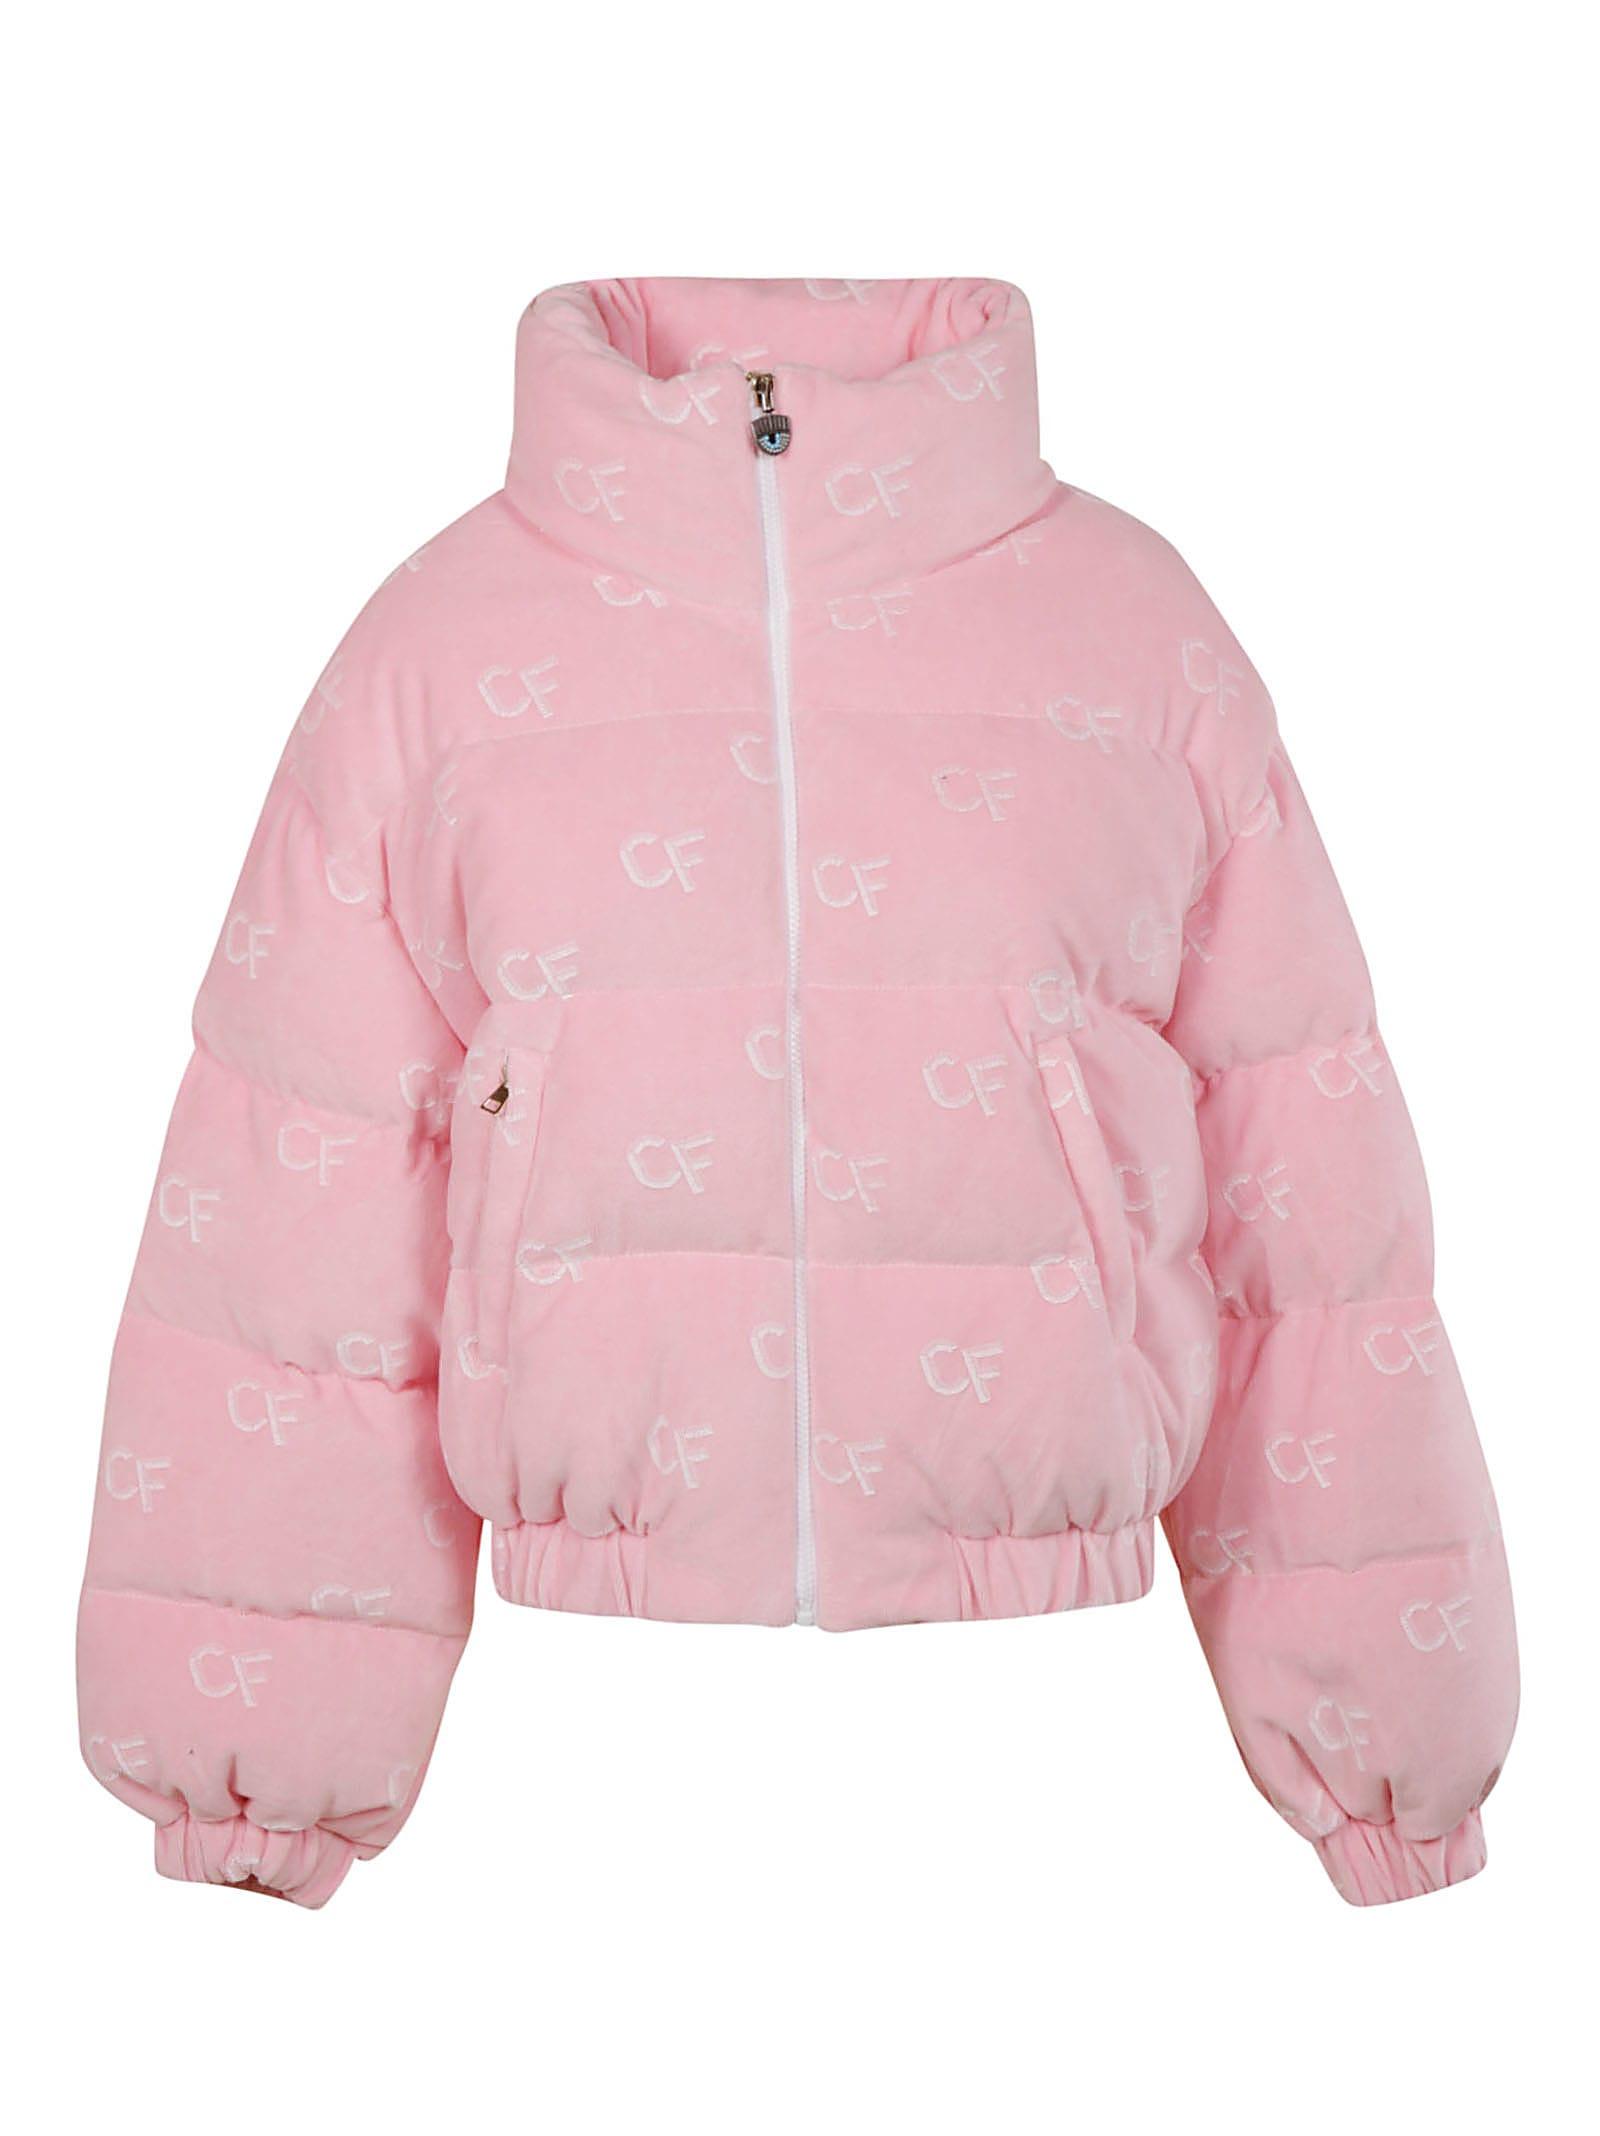 Chiara Ferragni Pattern Down Jacket